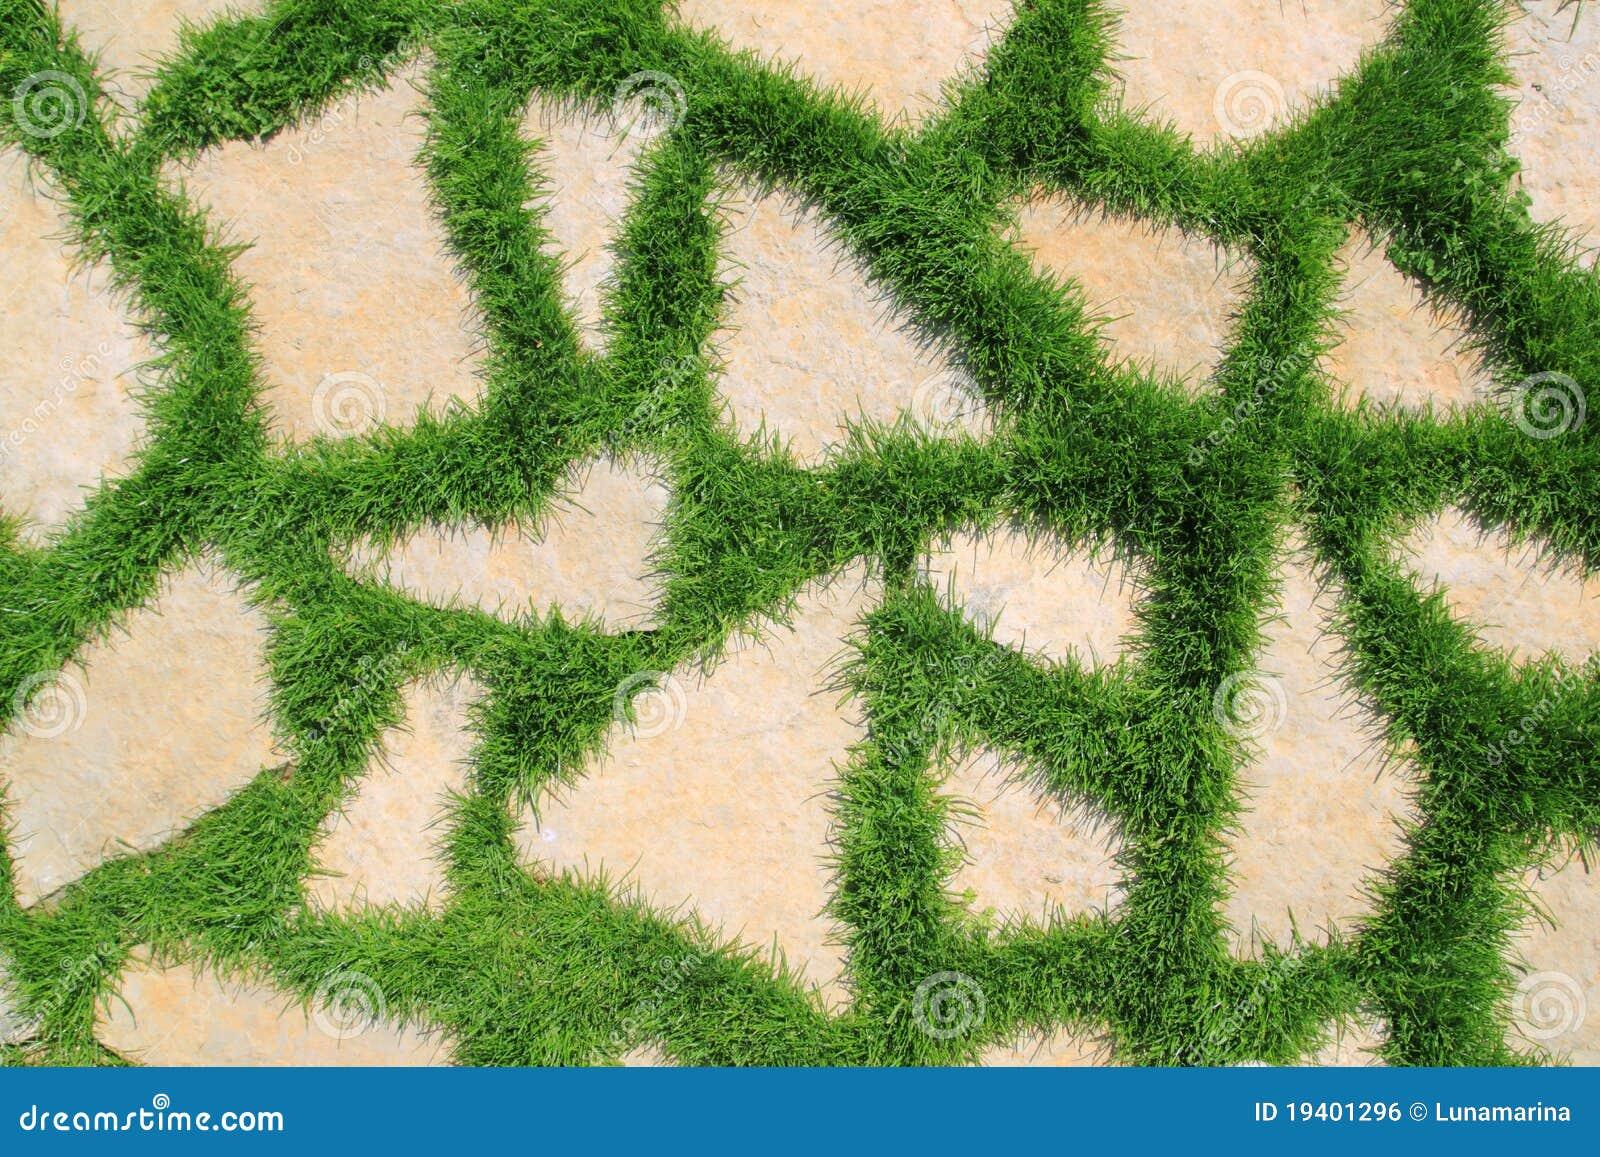 Chemin en pierre dans la texture de jardin d 39 herbe verte image libre de d - Chemin de jardin en pierre ...